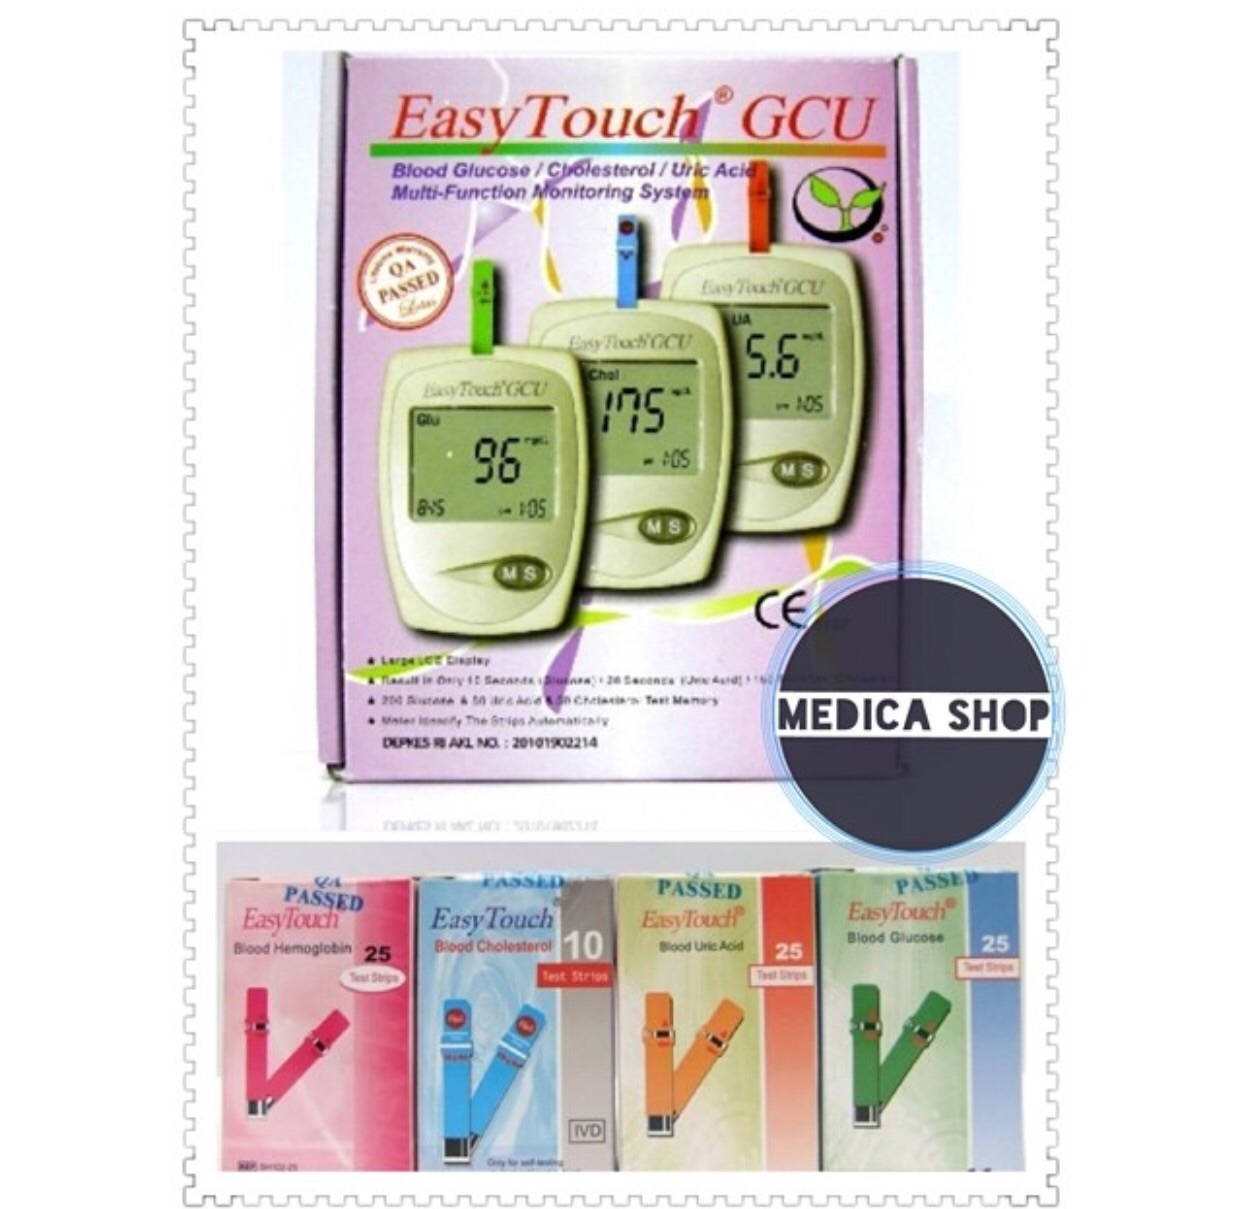 Easytouch Paket Strips Gula Darah 25 Asam Urat Strip Easy Touch Glukosa Kolestrol Source Jual